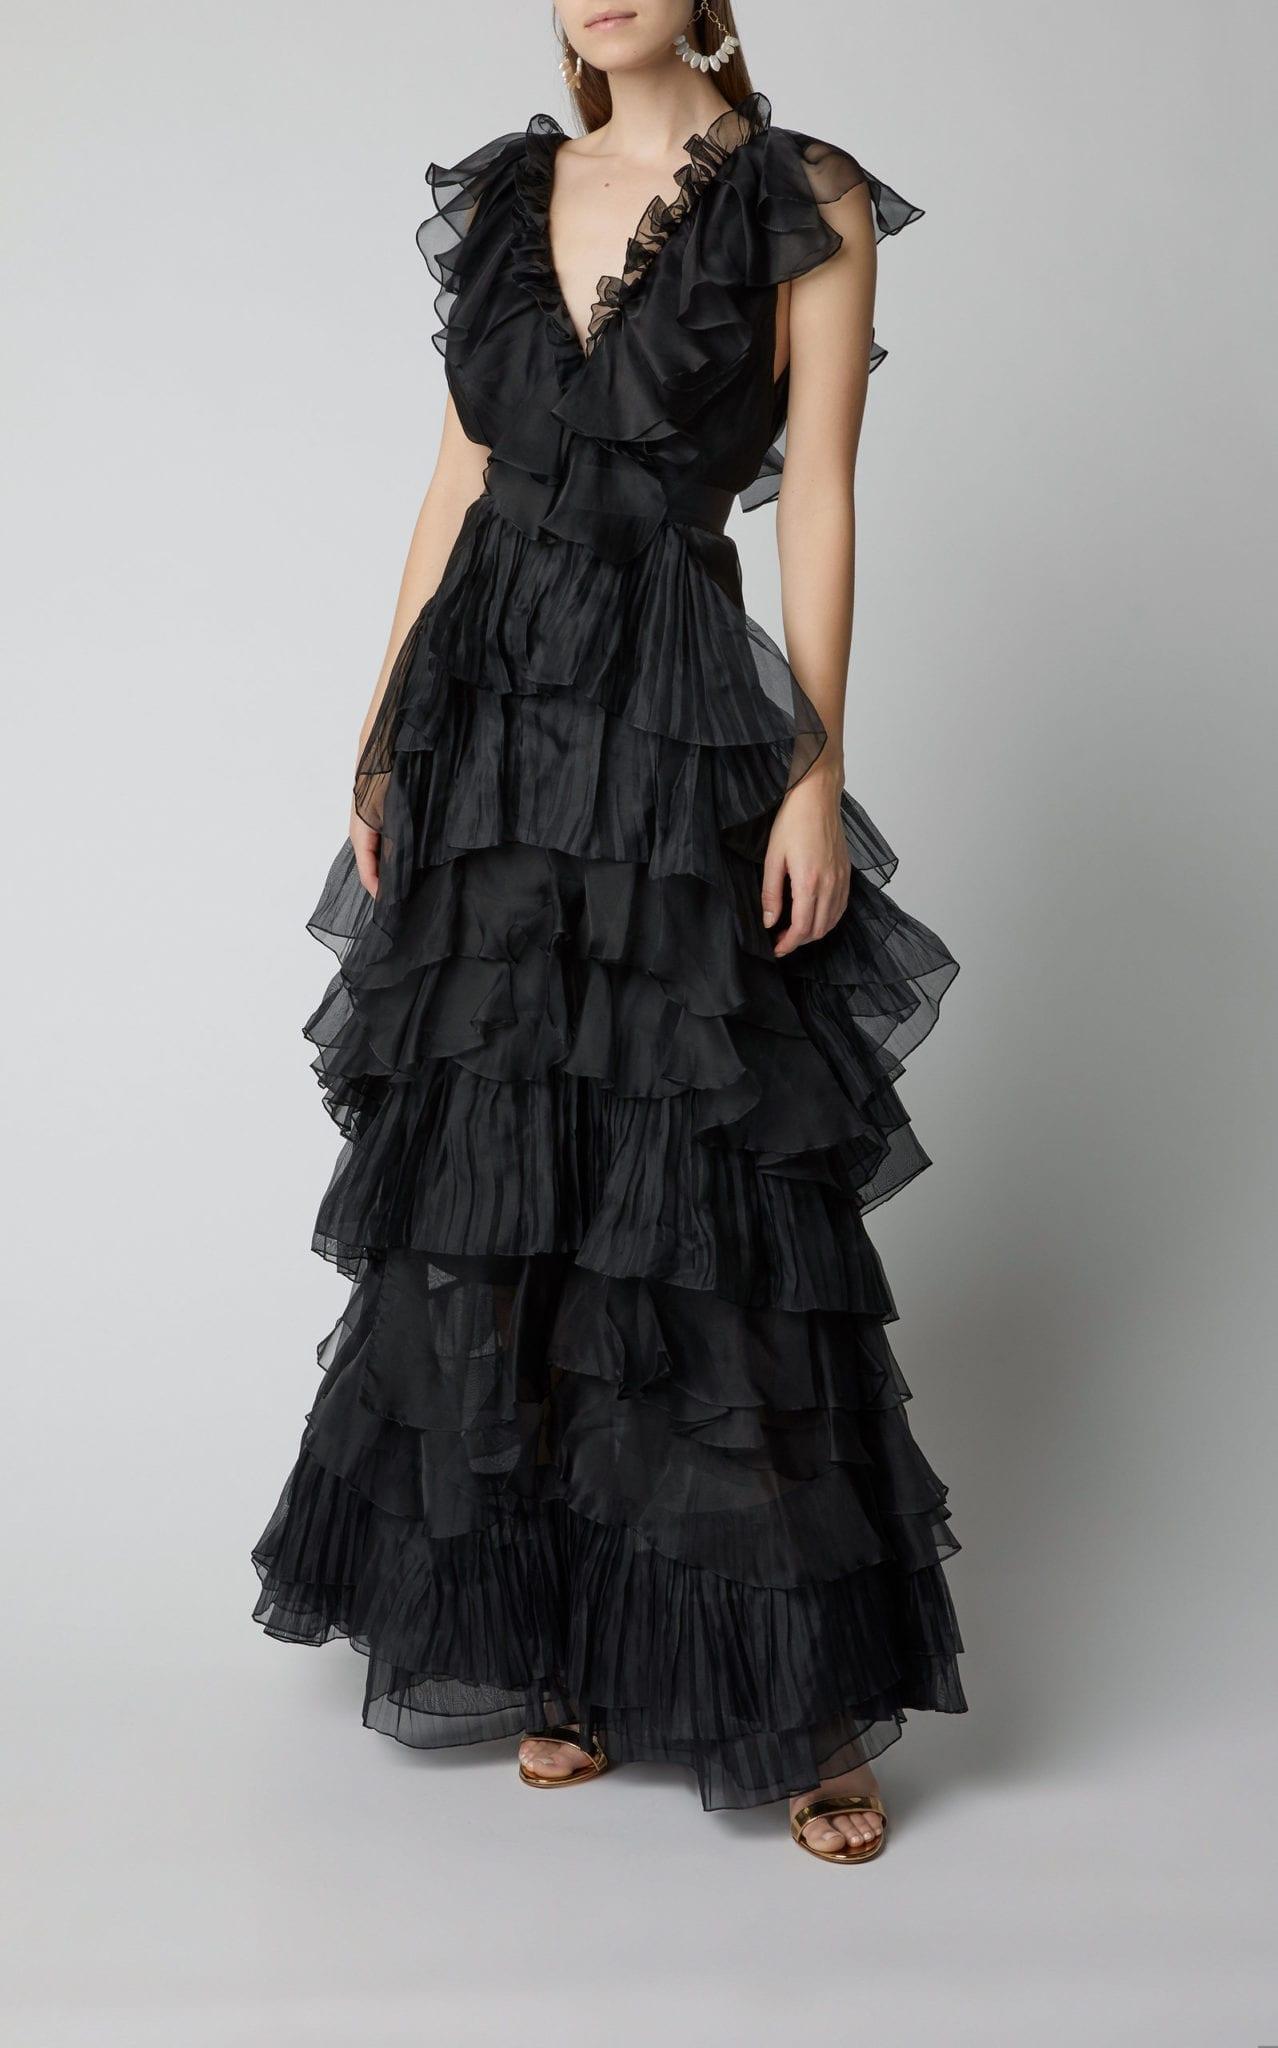 JOHANNA ORTIZ Melancholy Dance Ruffled Silk-Organza Black Gown